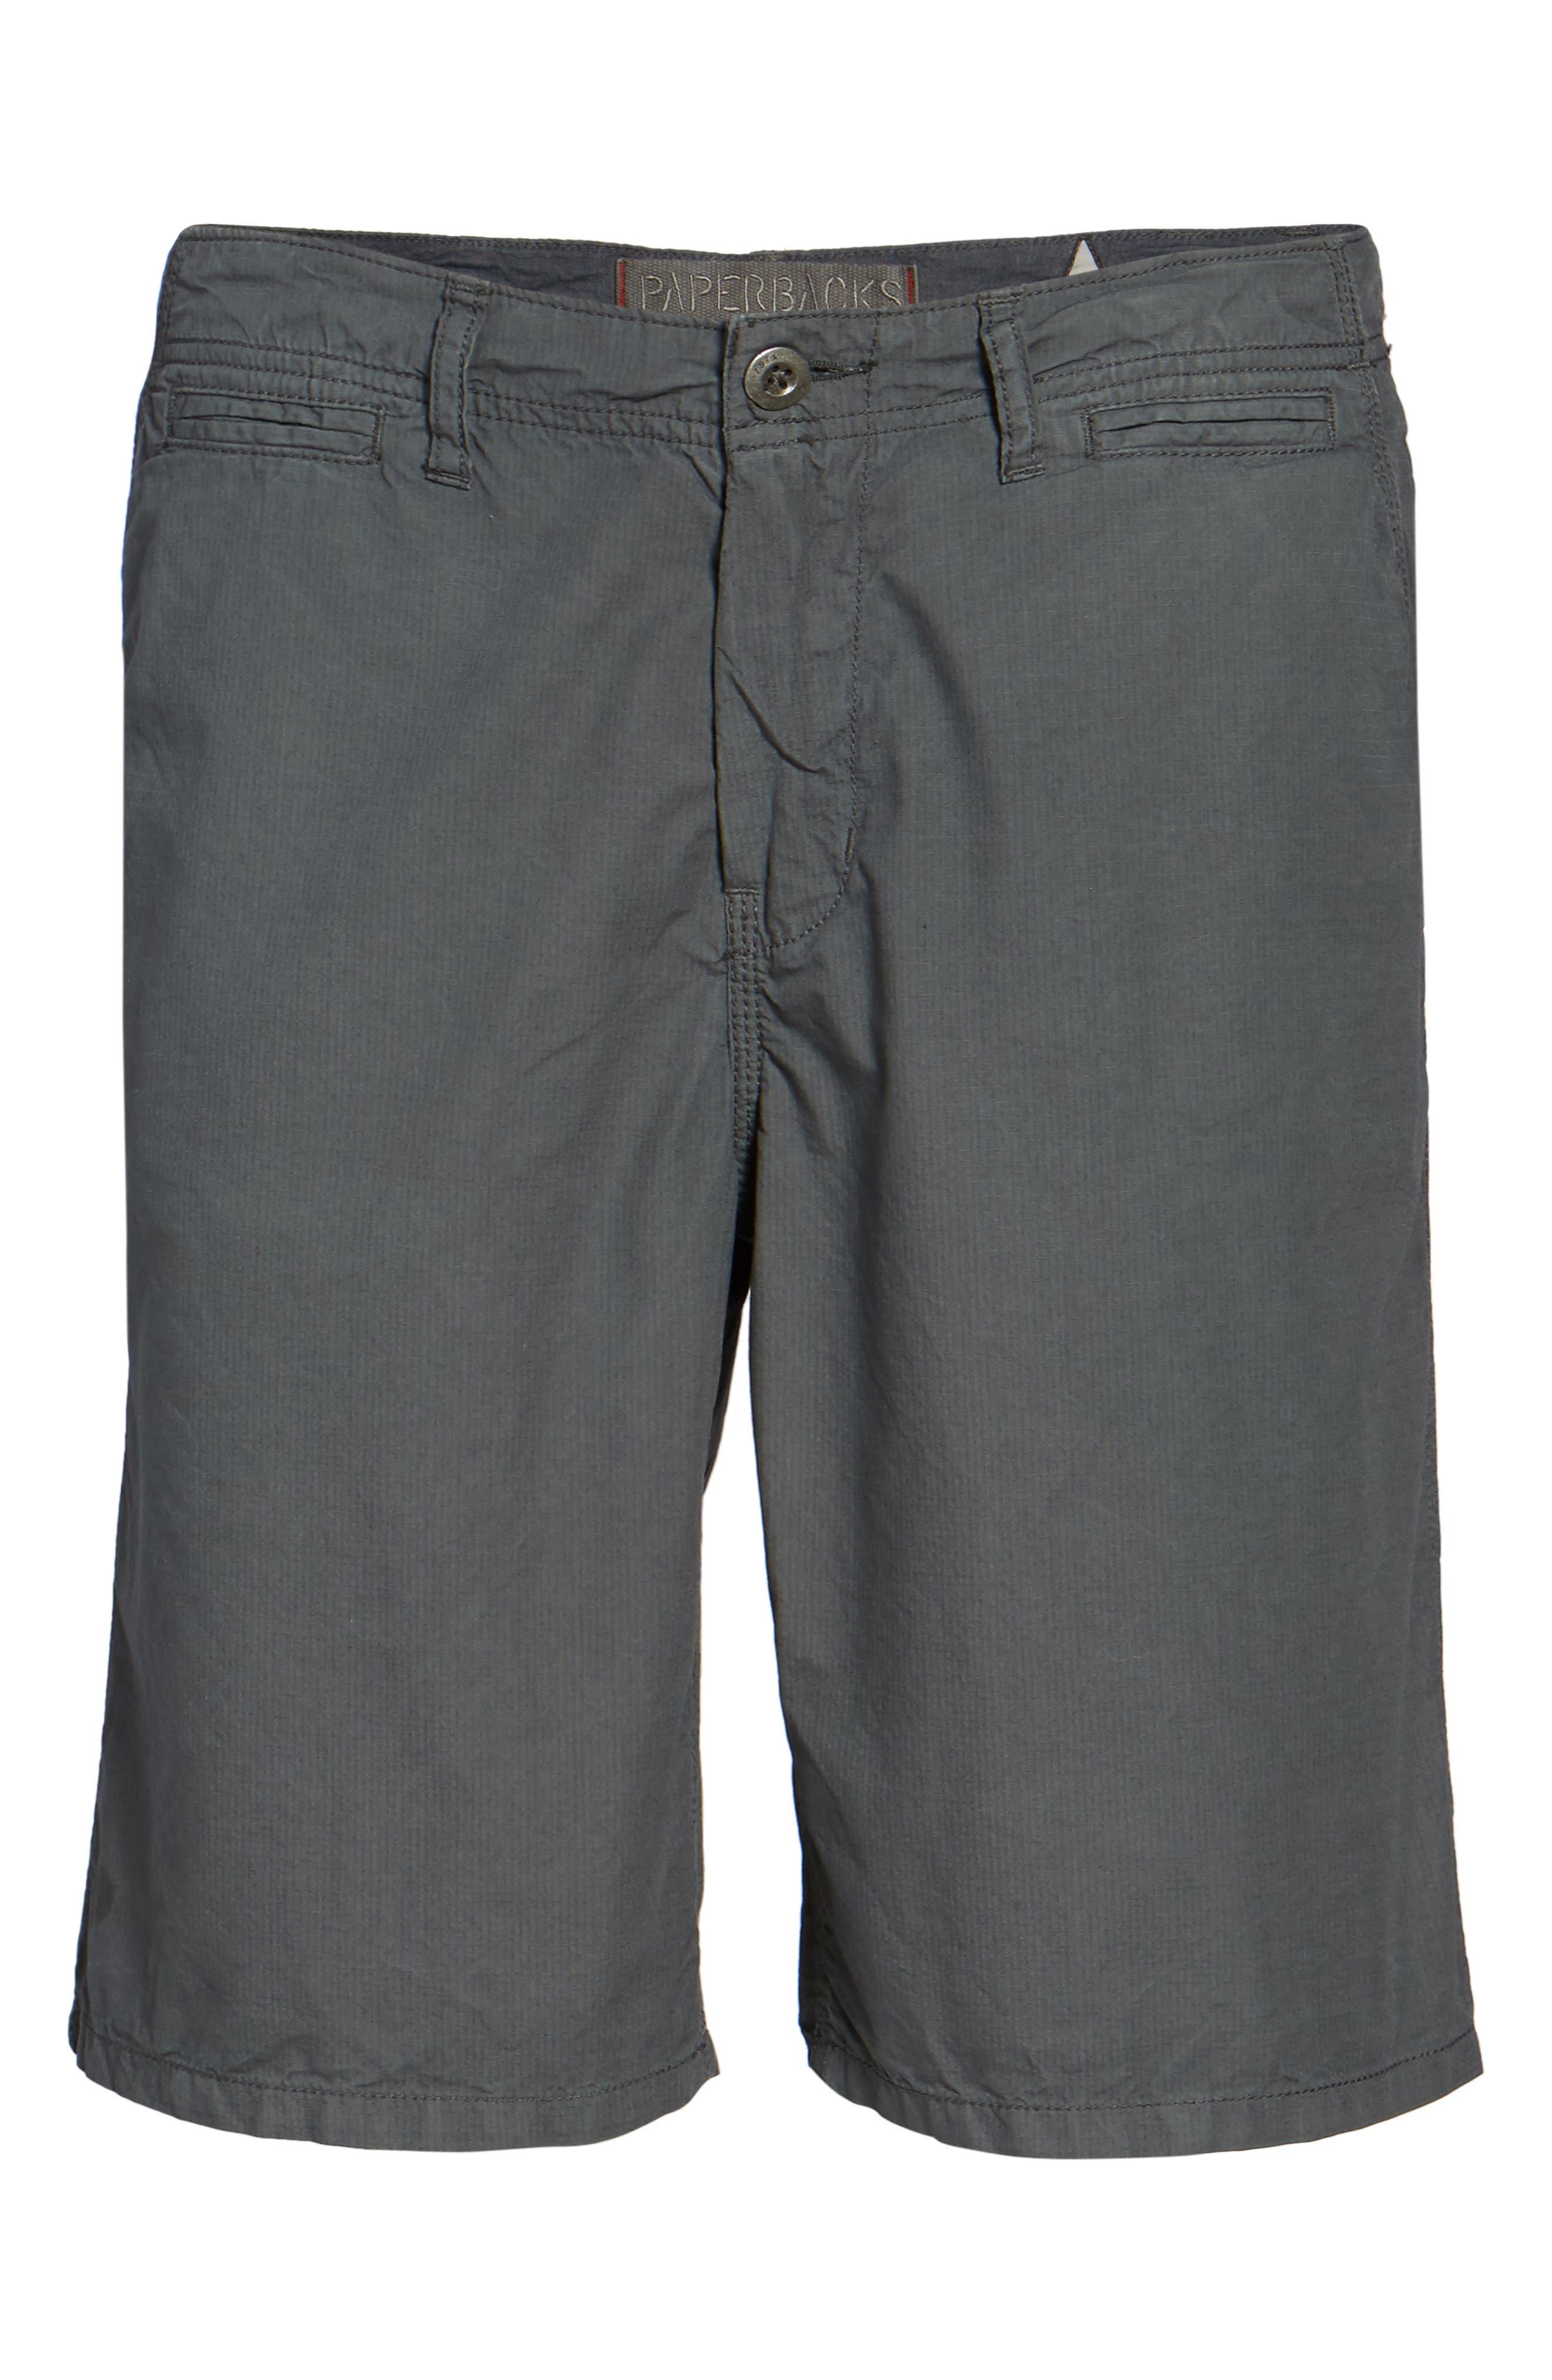 Palm Springs Shorts,                             Alternate thumbnail 32, color,